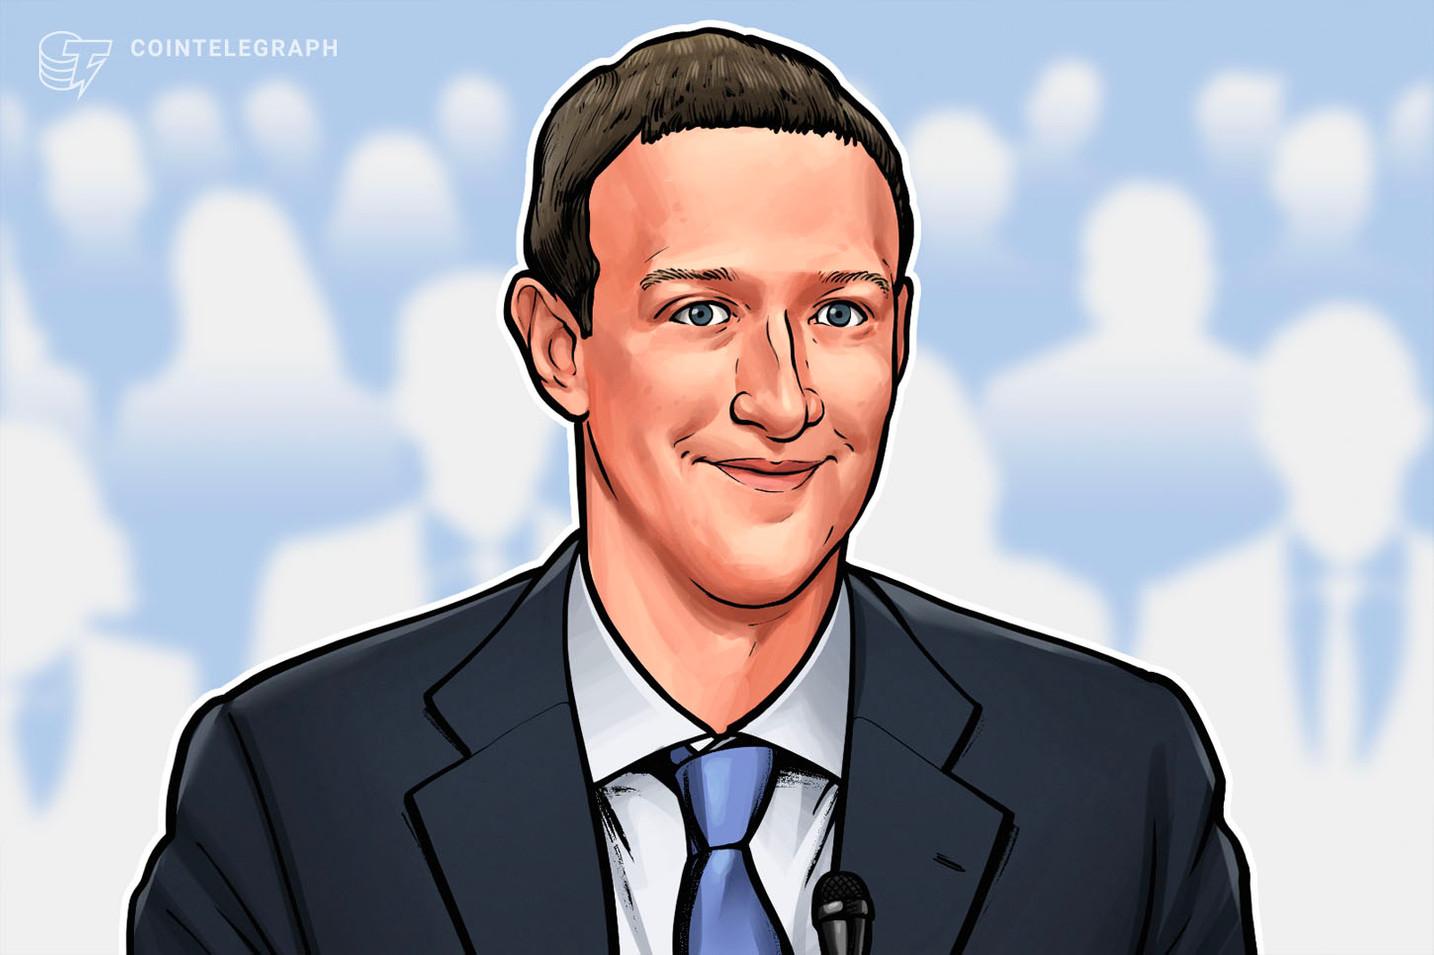 Facebook's Zuckerberg Calls for Digital Community Self-Governance